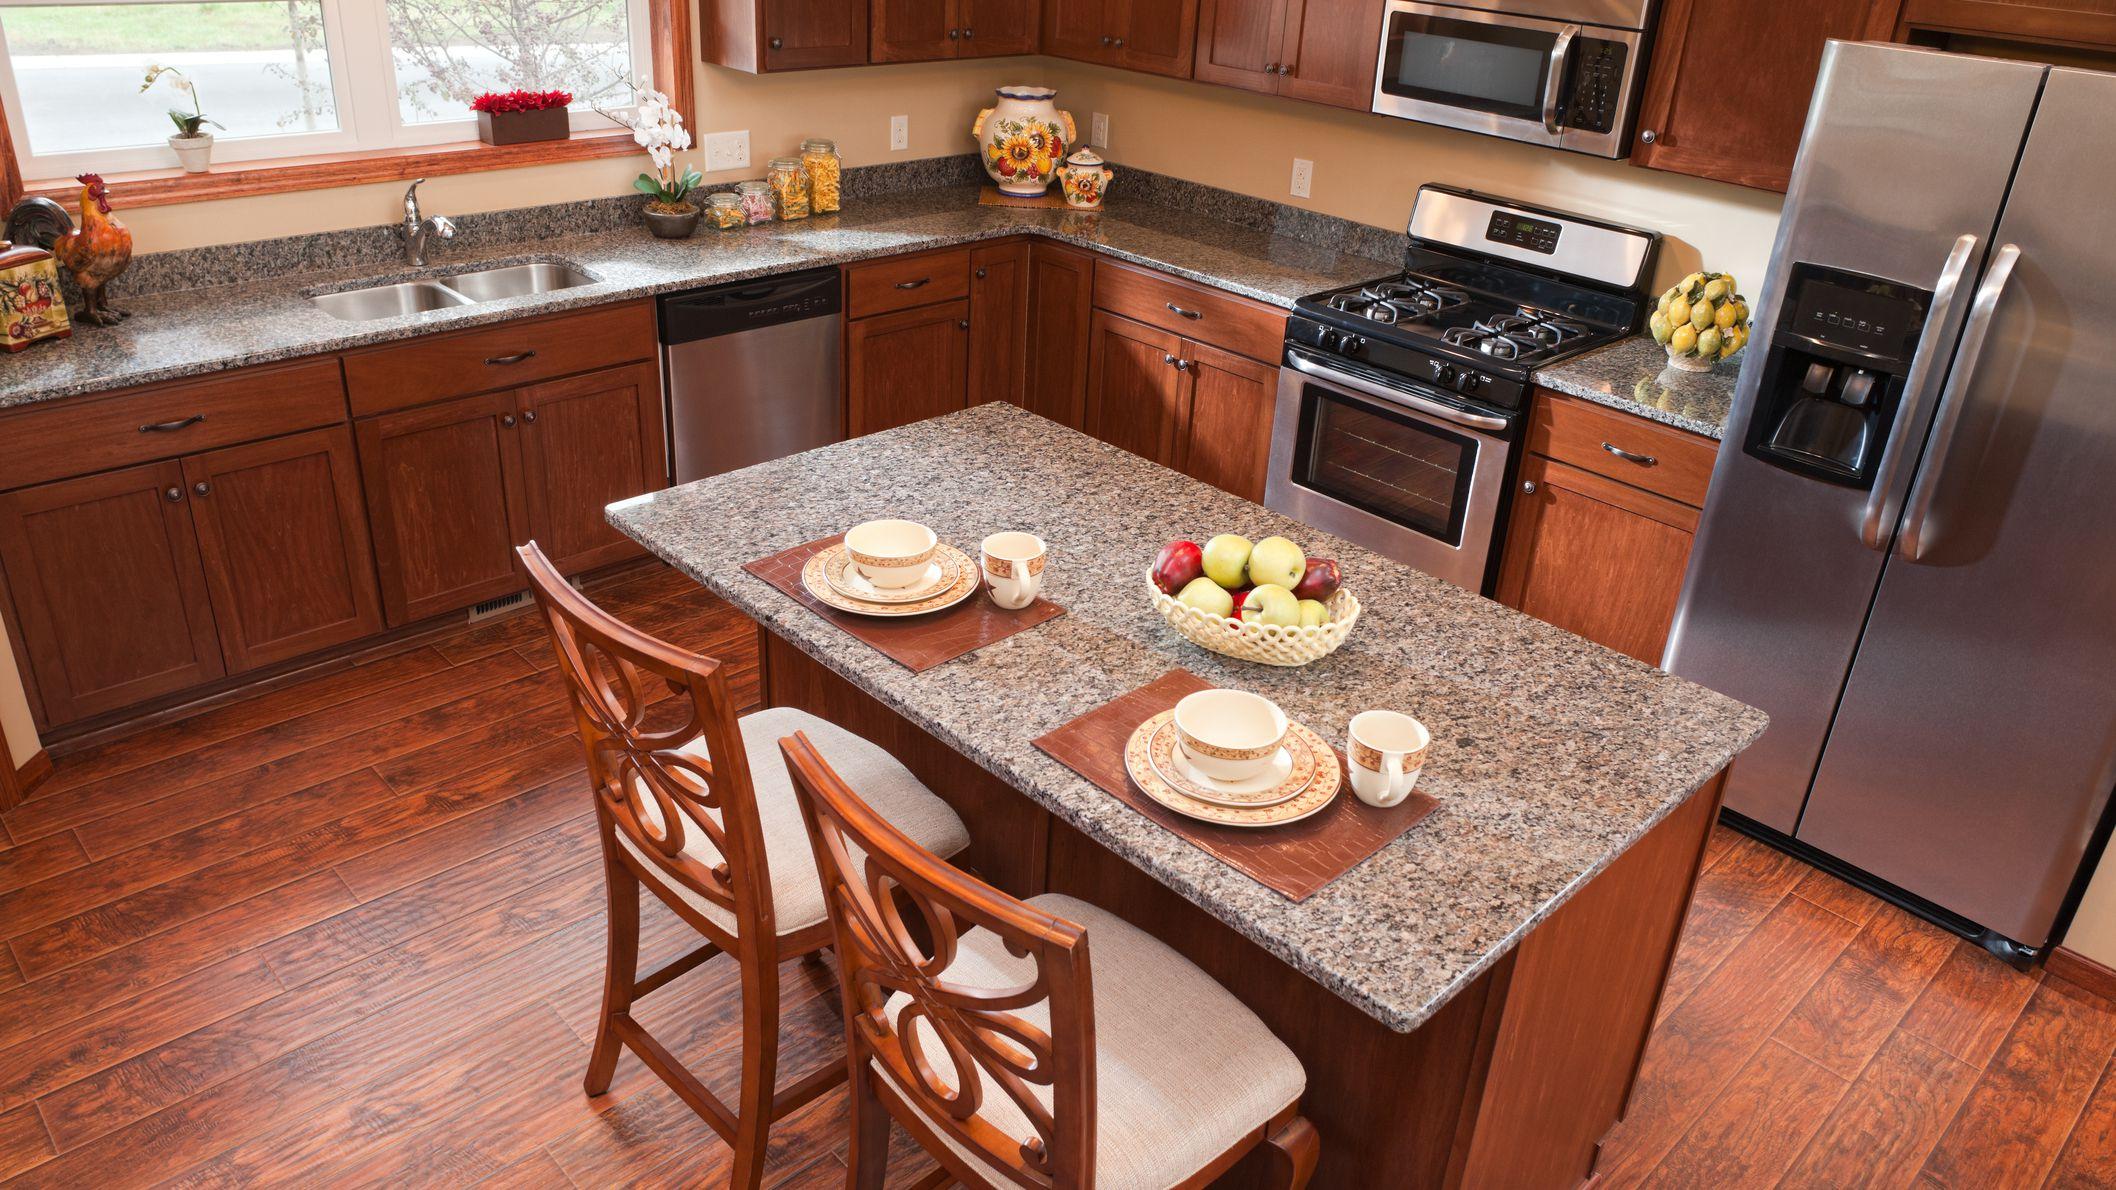 laminate flooring in the kitchen